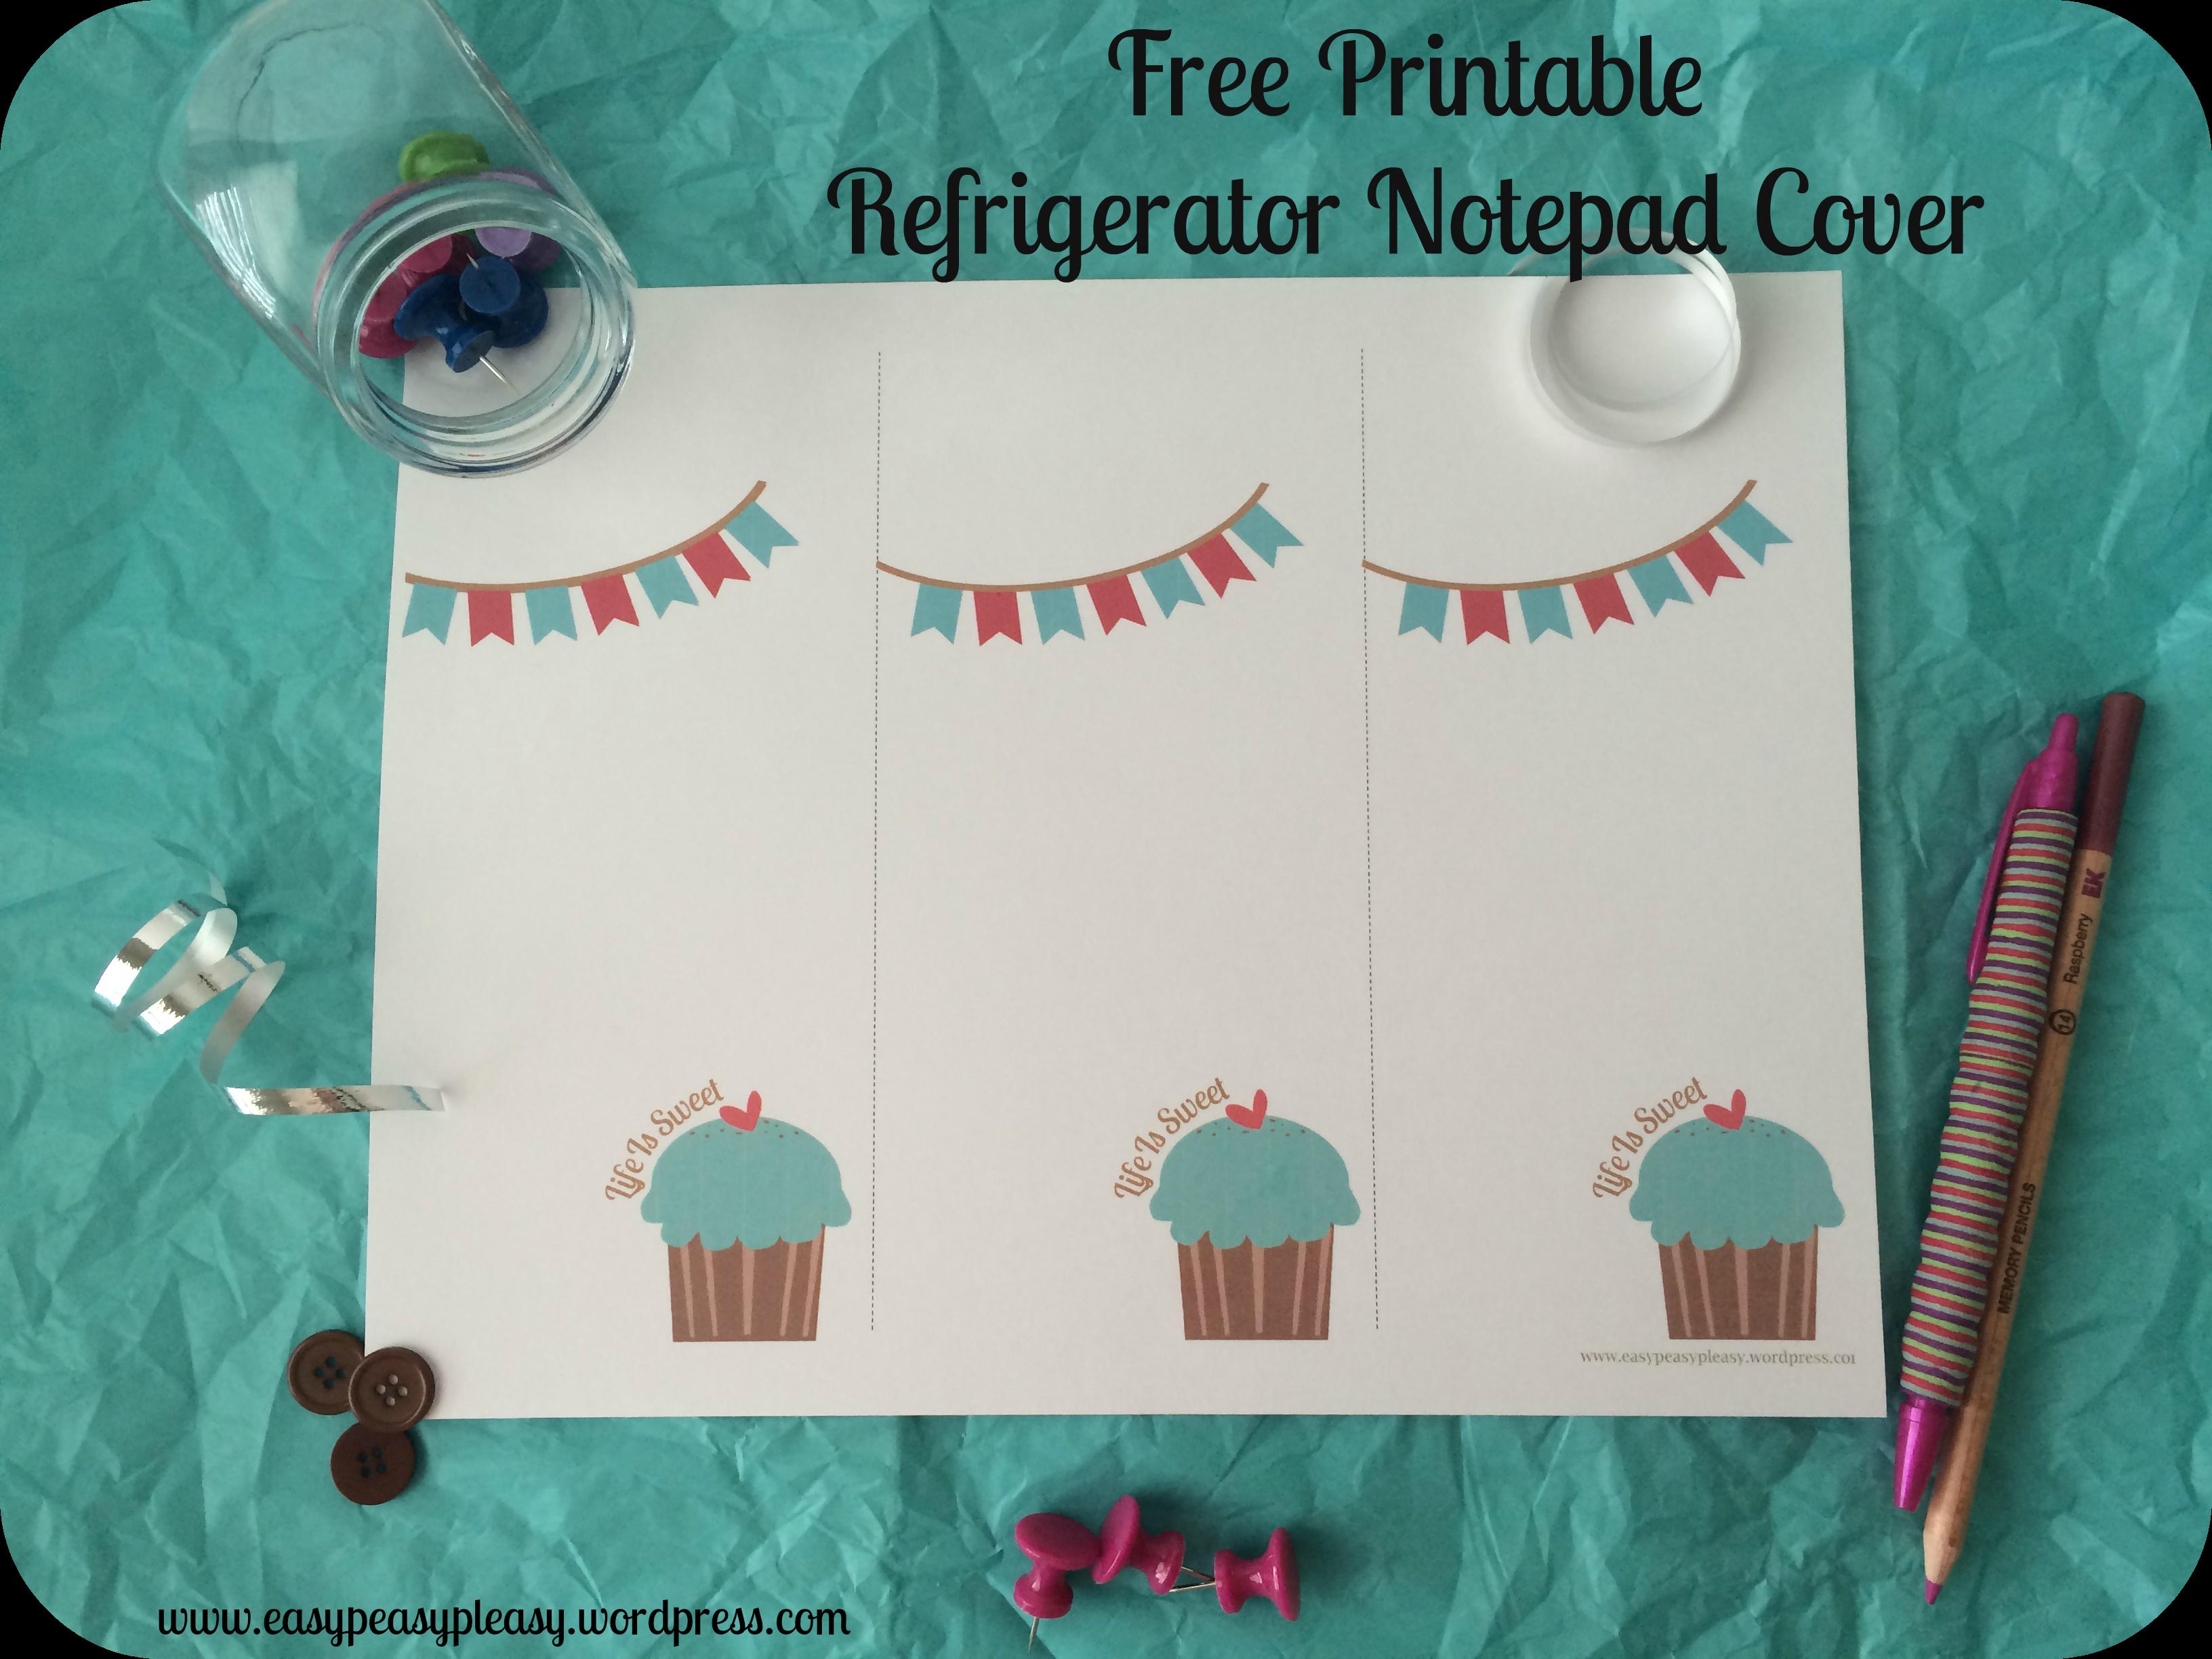 Free Printable Refrigerator Notepad Cover Full Sheet